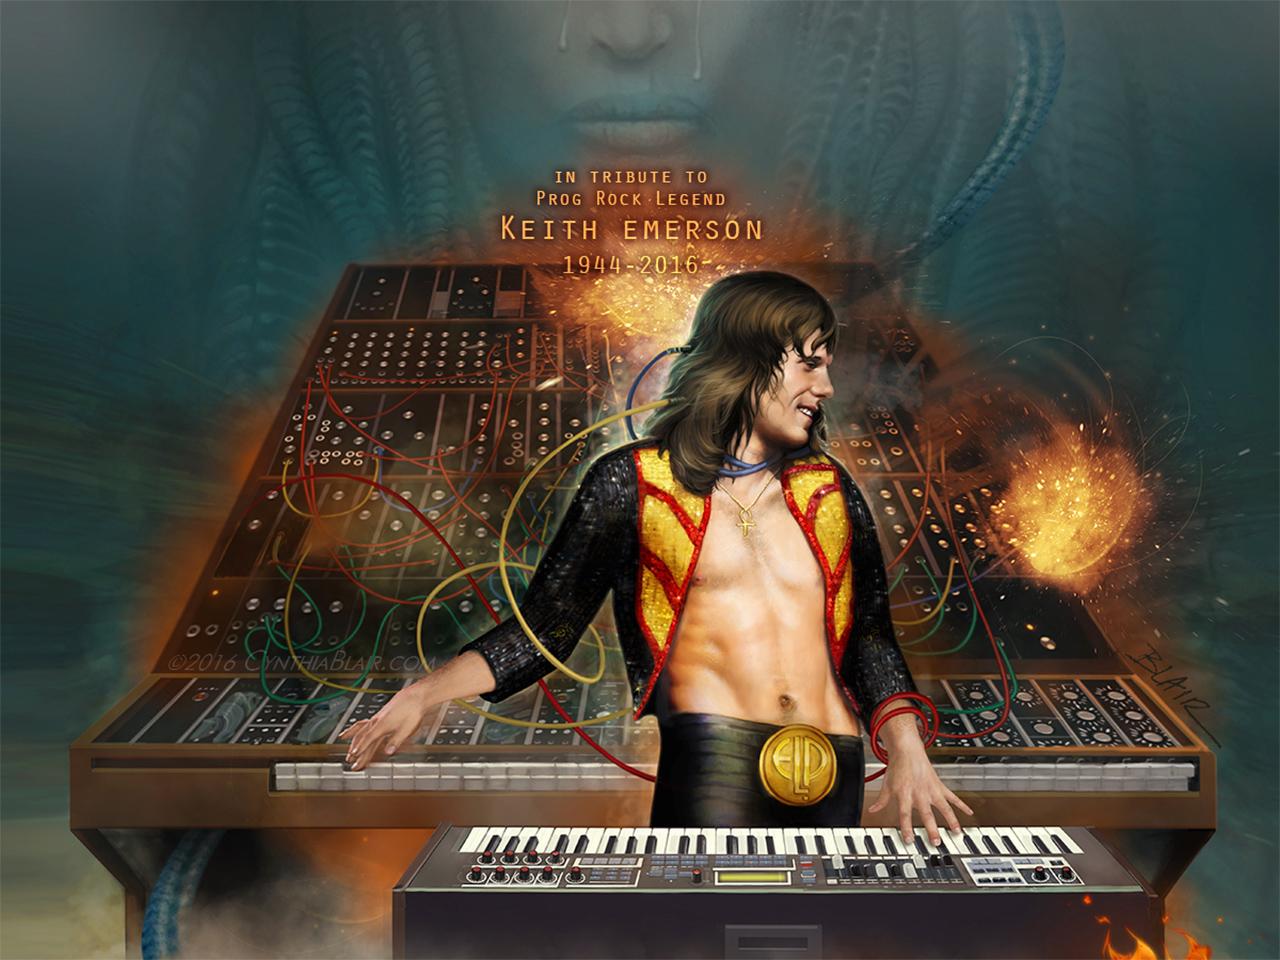 Keith Emerson, ELP By Cynthia-Blair On DeviantArt